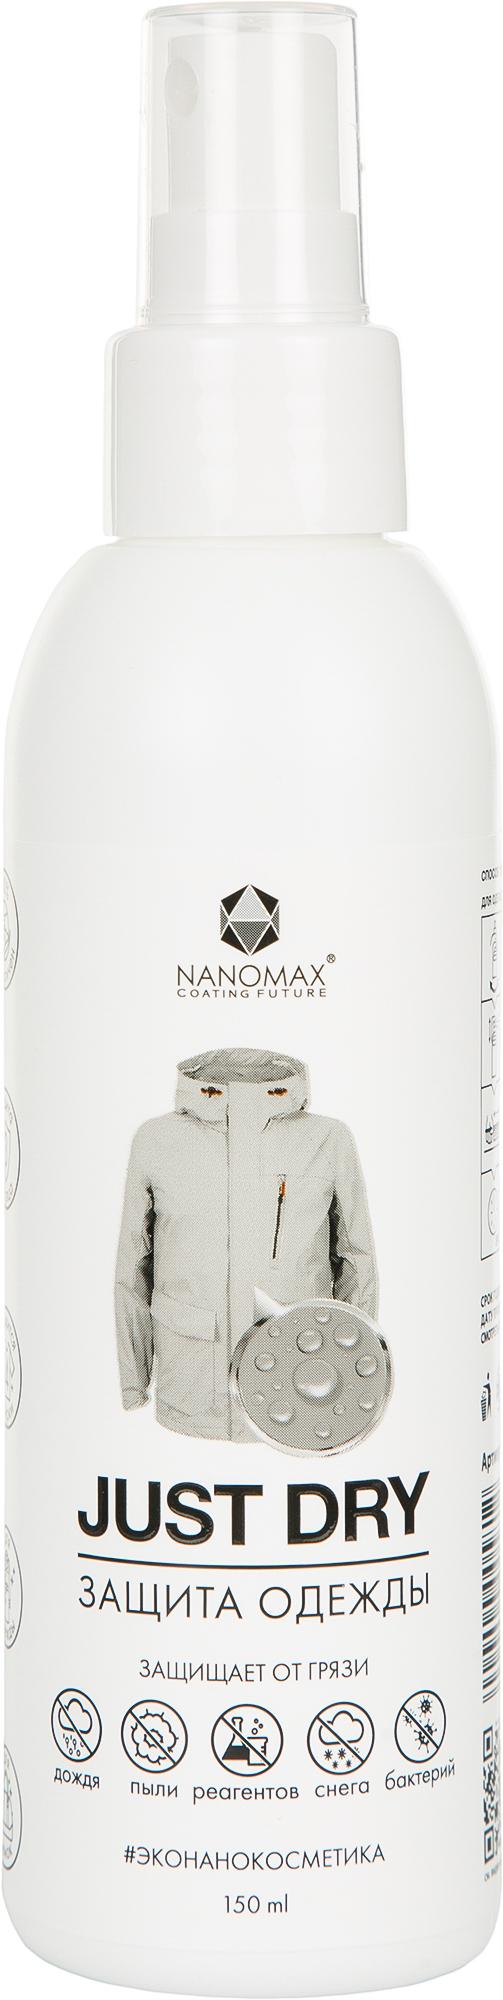 Nanomax Средство для ухода за одеждой Just Dry